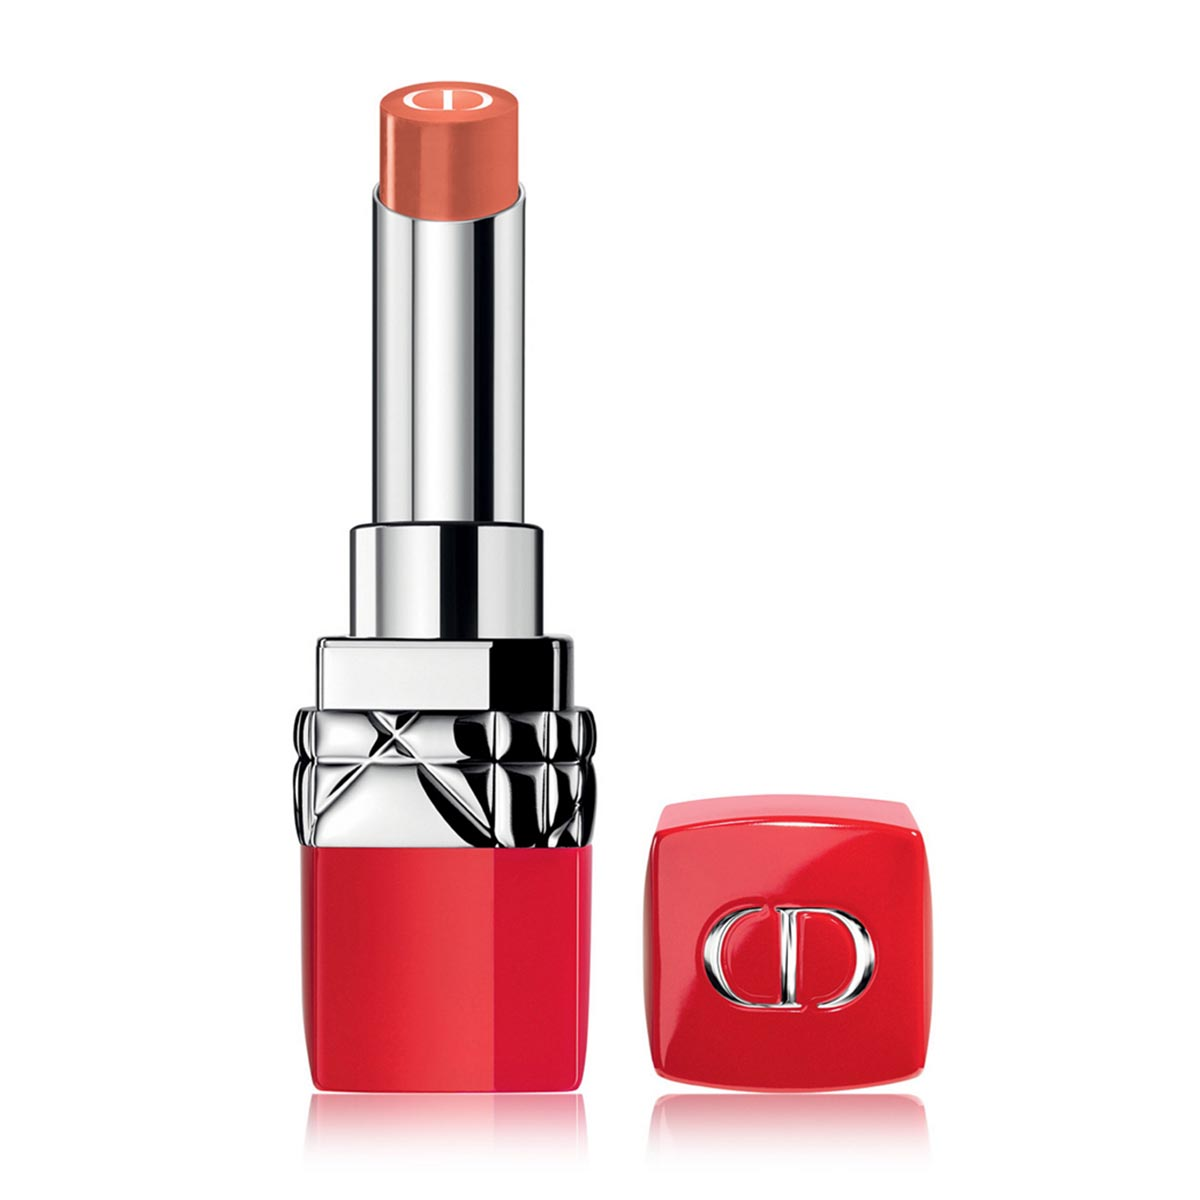 Dior rouge dior ultra care lipstick 168 petal